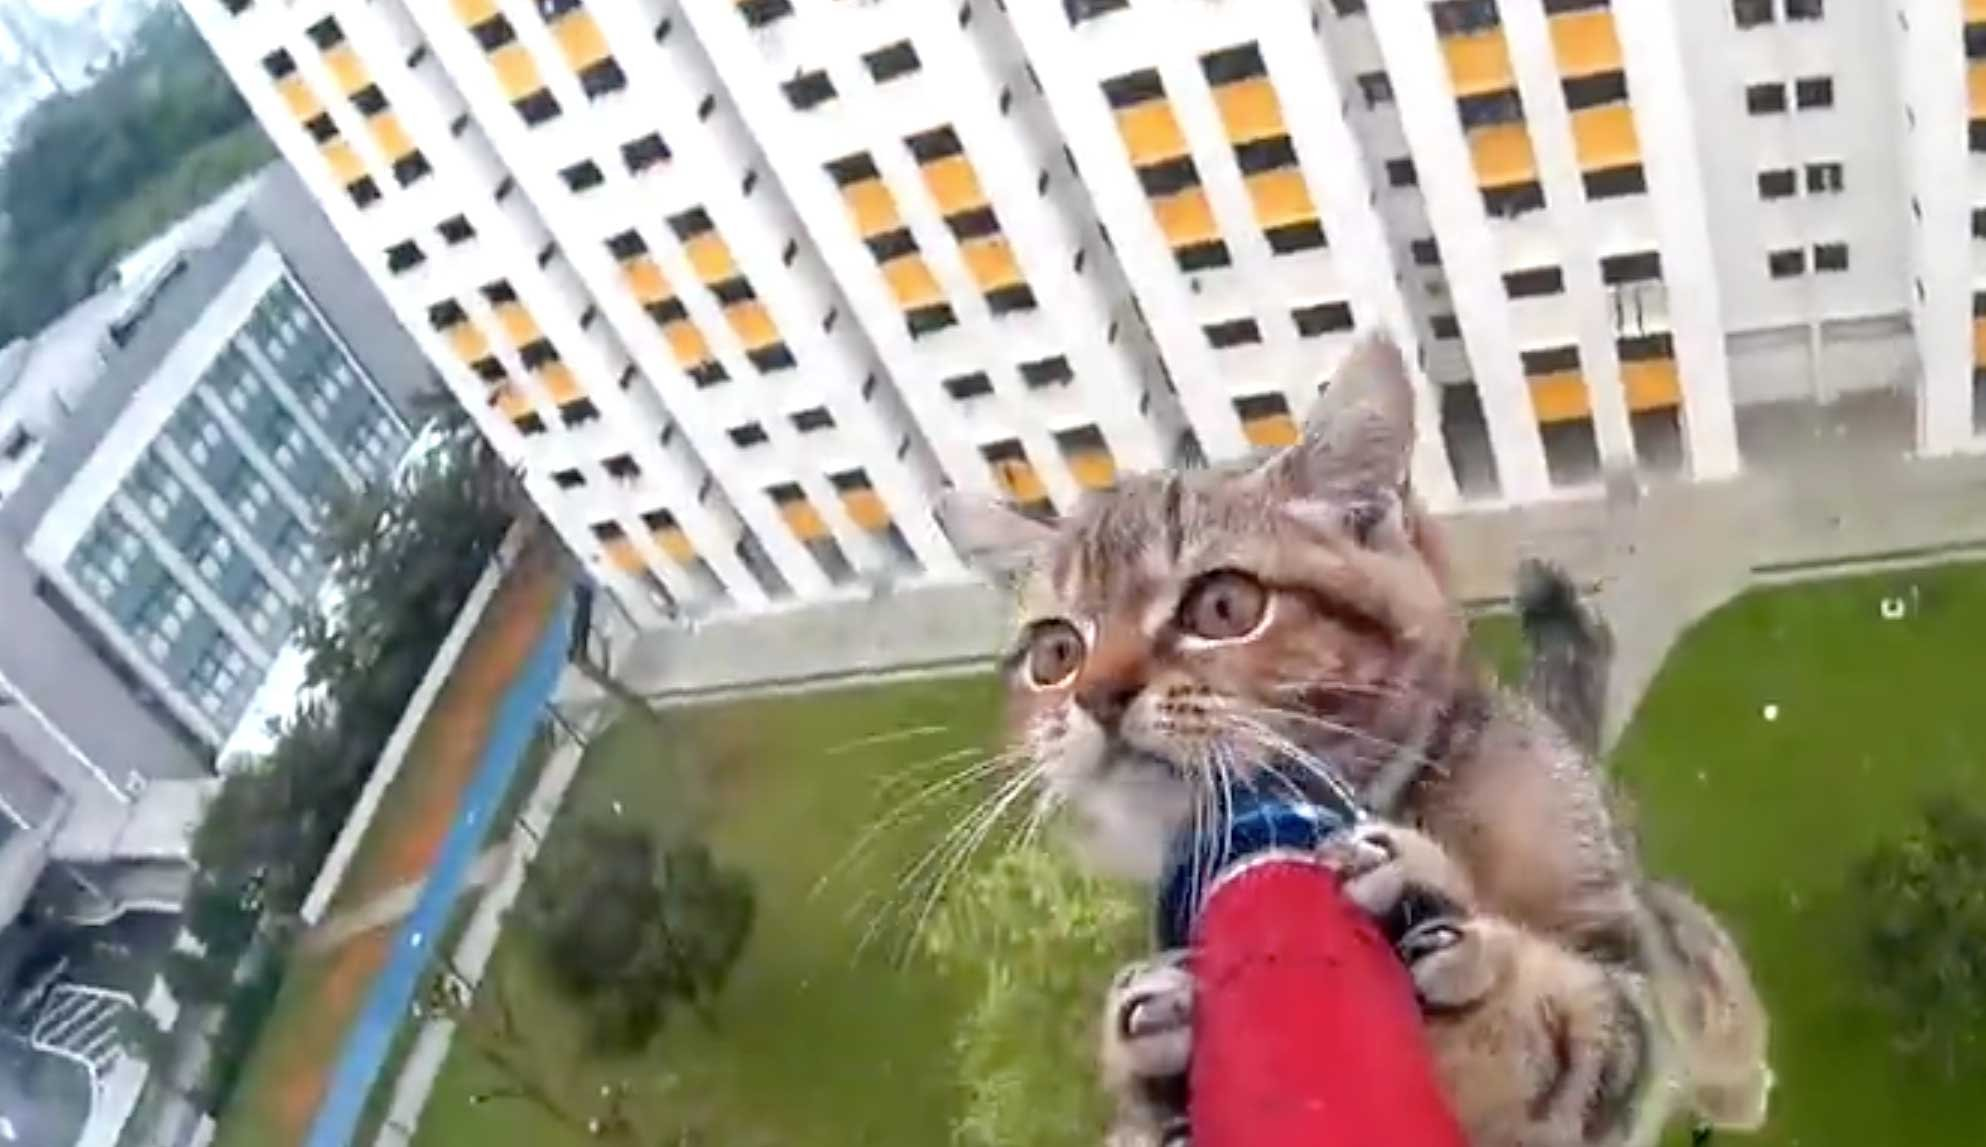 kittensavedfromledge.jpg?resize=412,232 - Helpless Kitten Stranded On A Ledge Was Saved By Rescue Officer